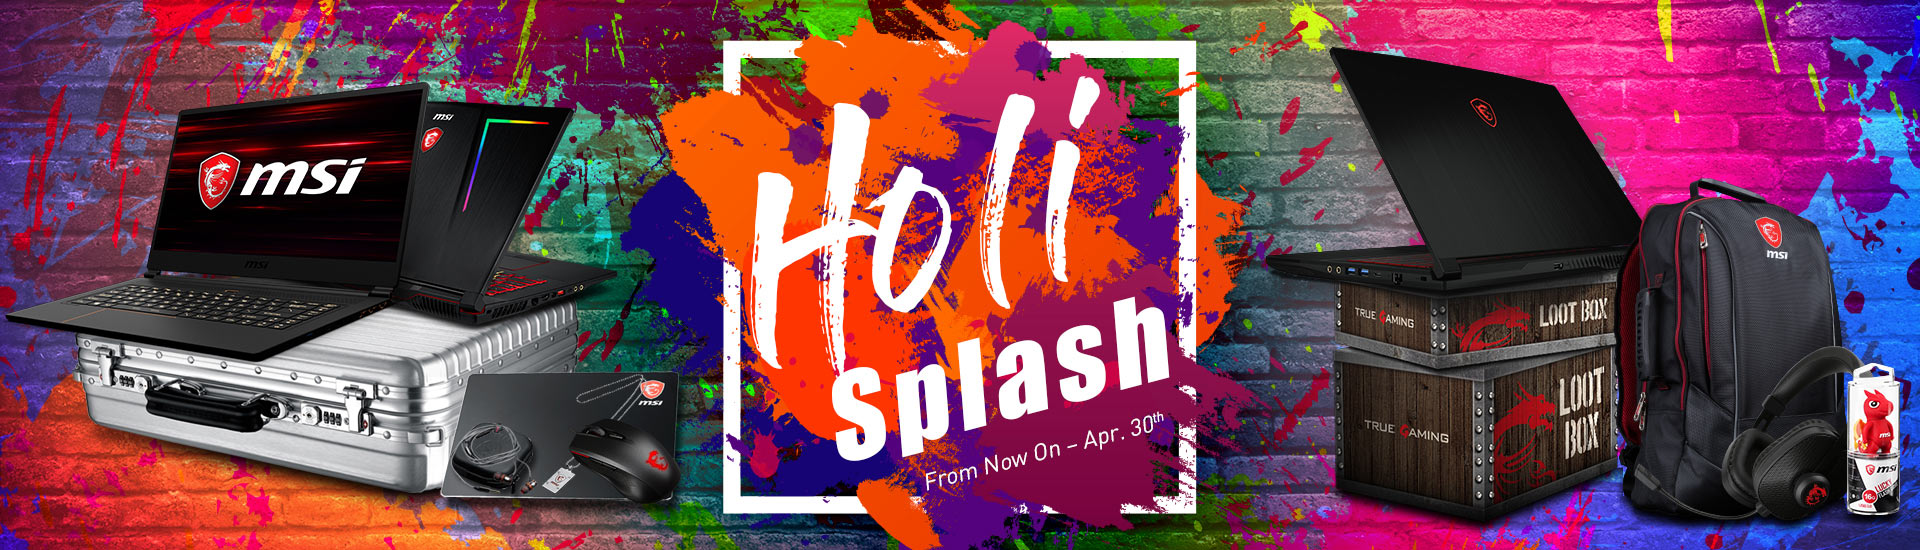 Holi splash